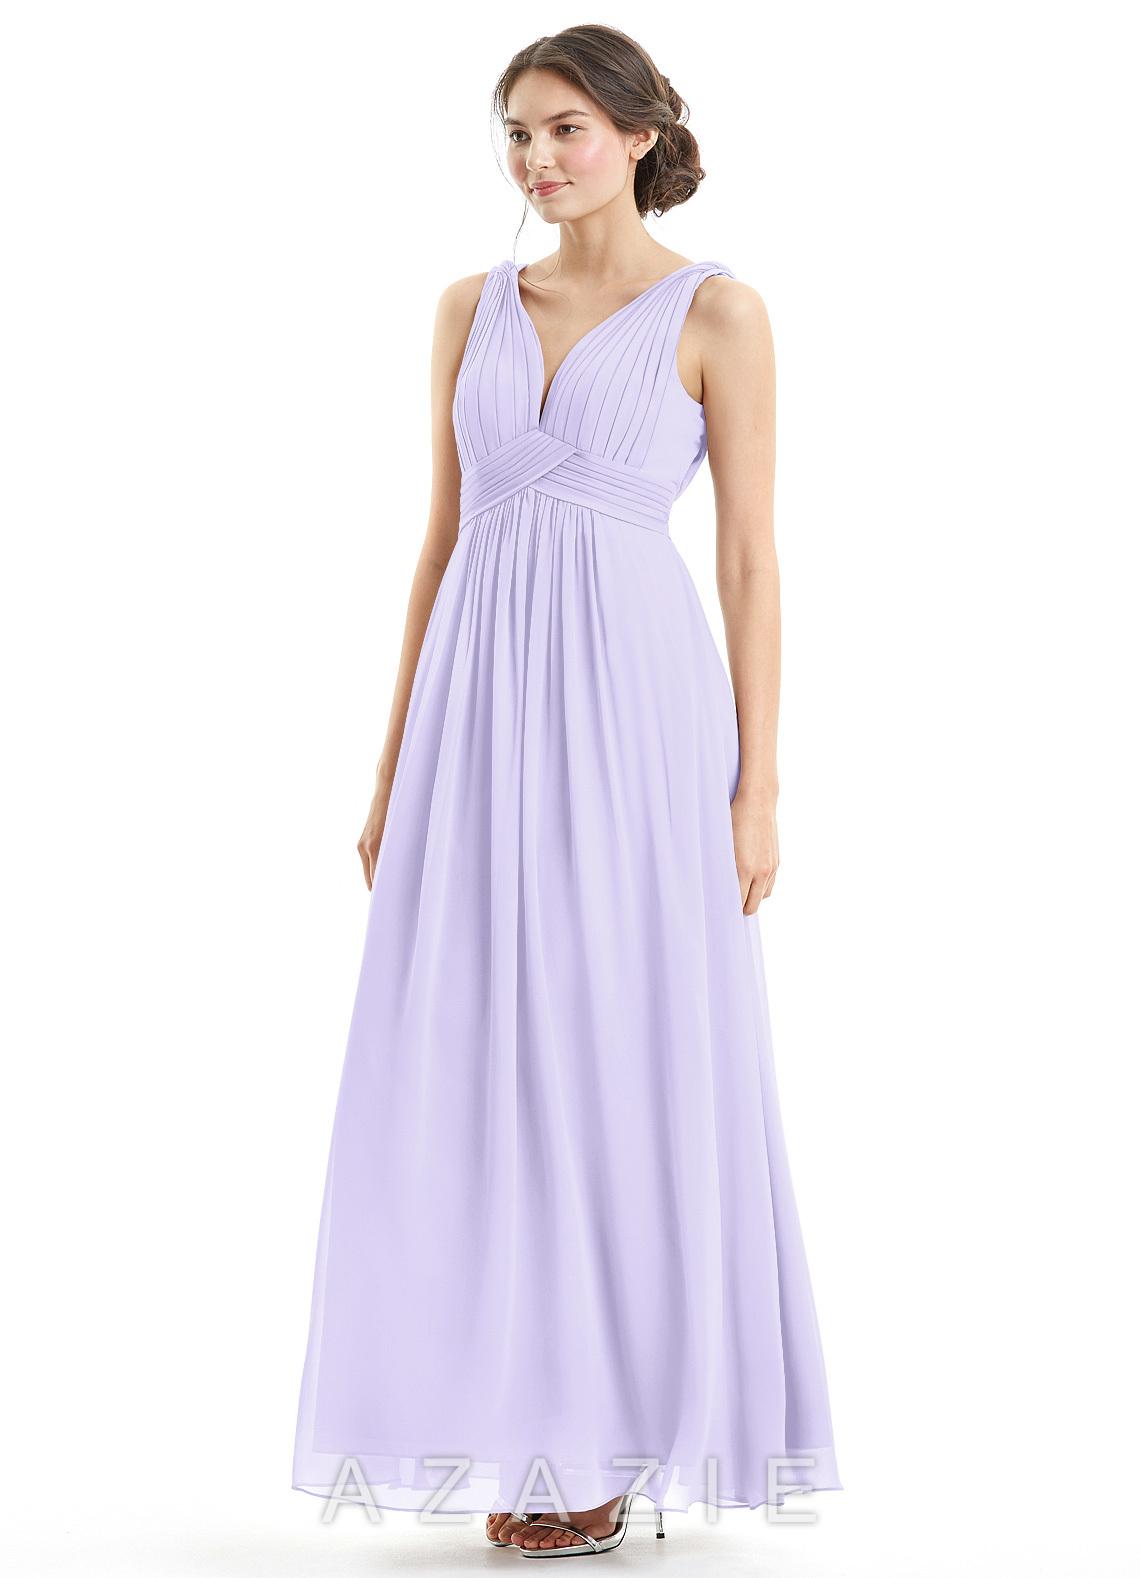 Azazie Hillary Bridesmaid Dress | Azazie - photo #14